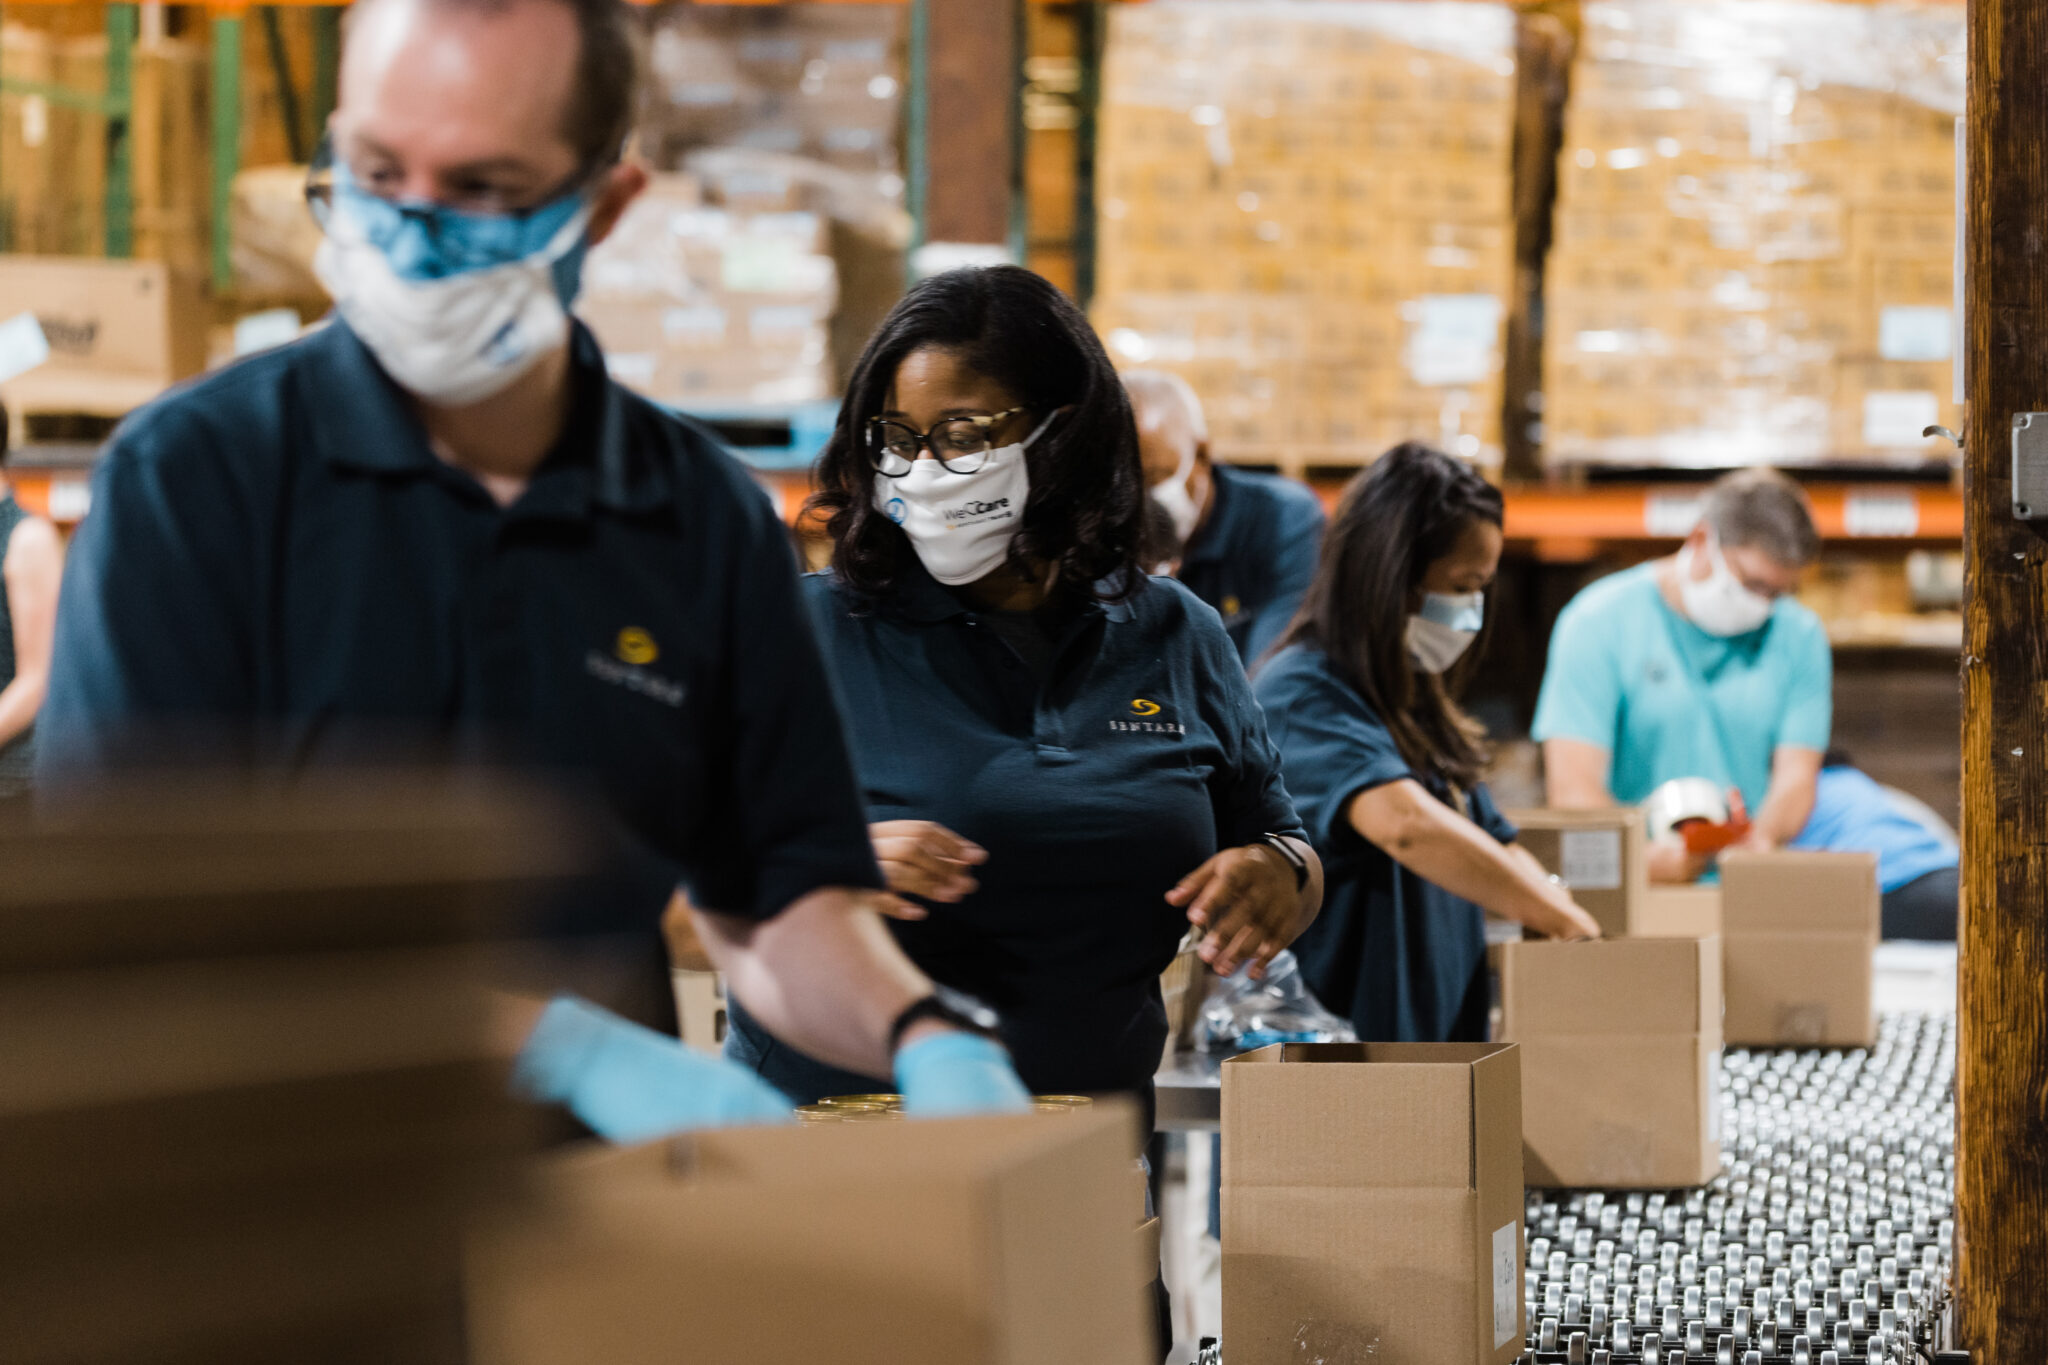 Sentara volunteers loading up boxes at Feed More